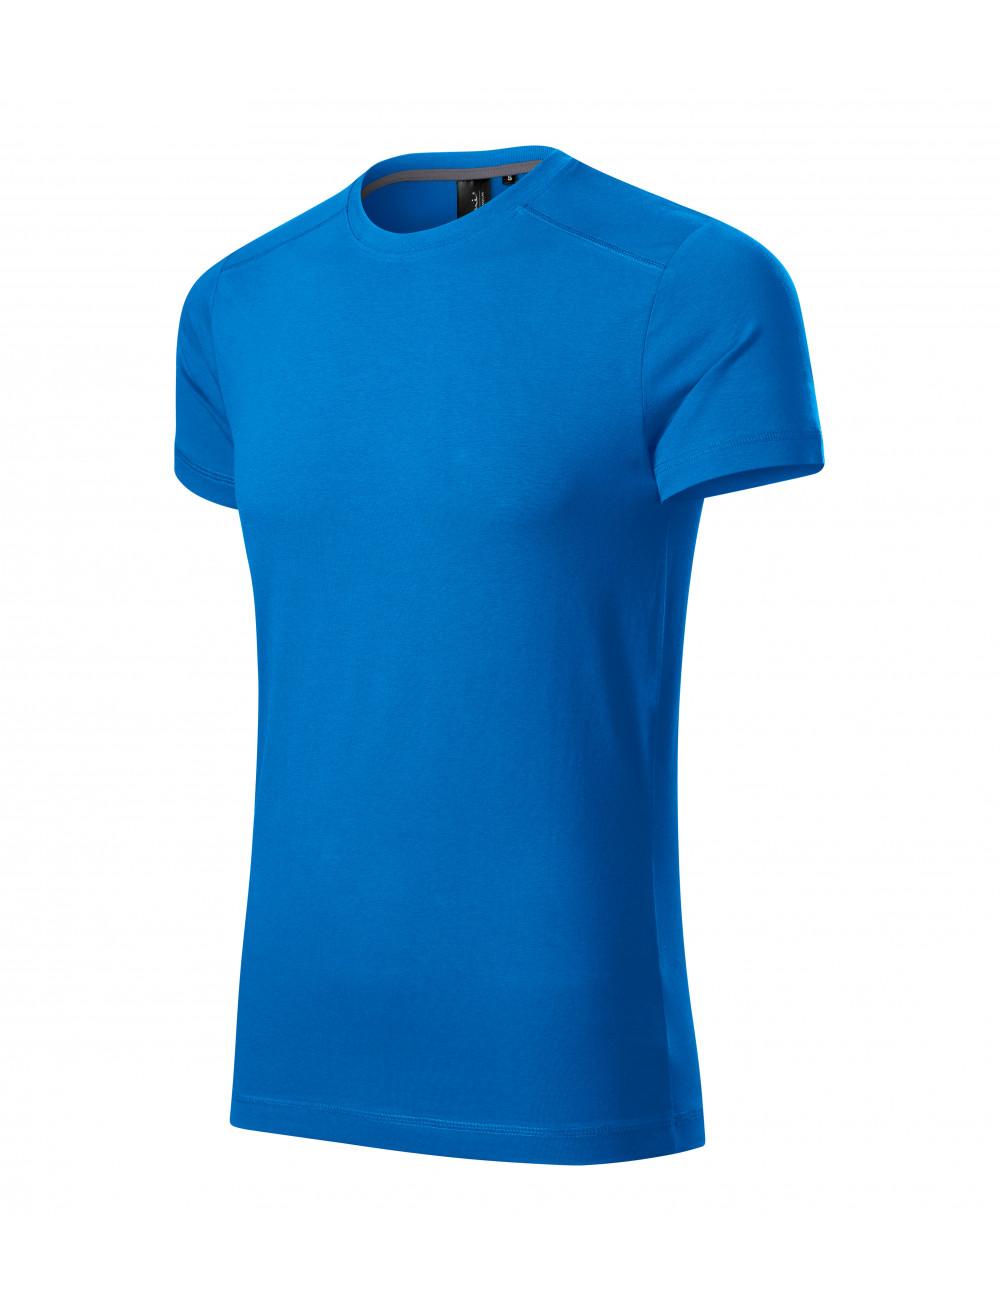 Adler MALFINIPREMIUM Koszulka męska Action 150 snorkel blue